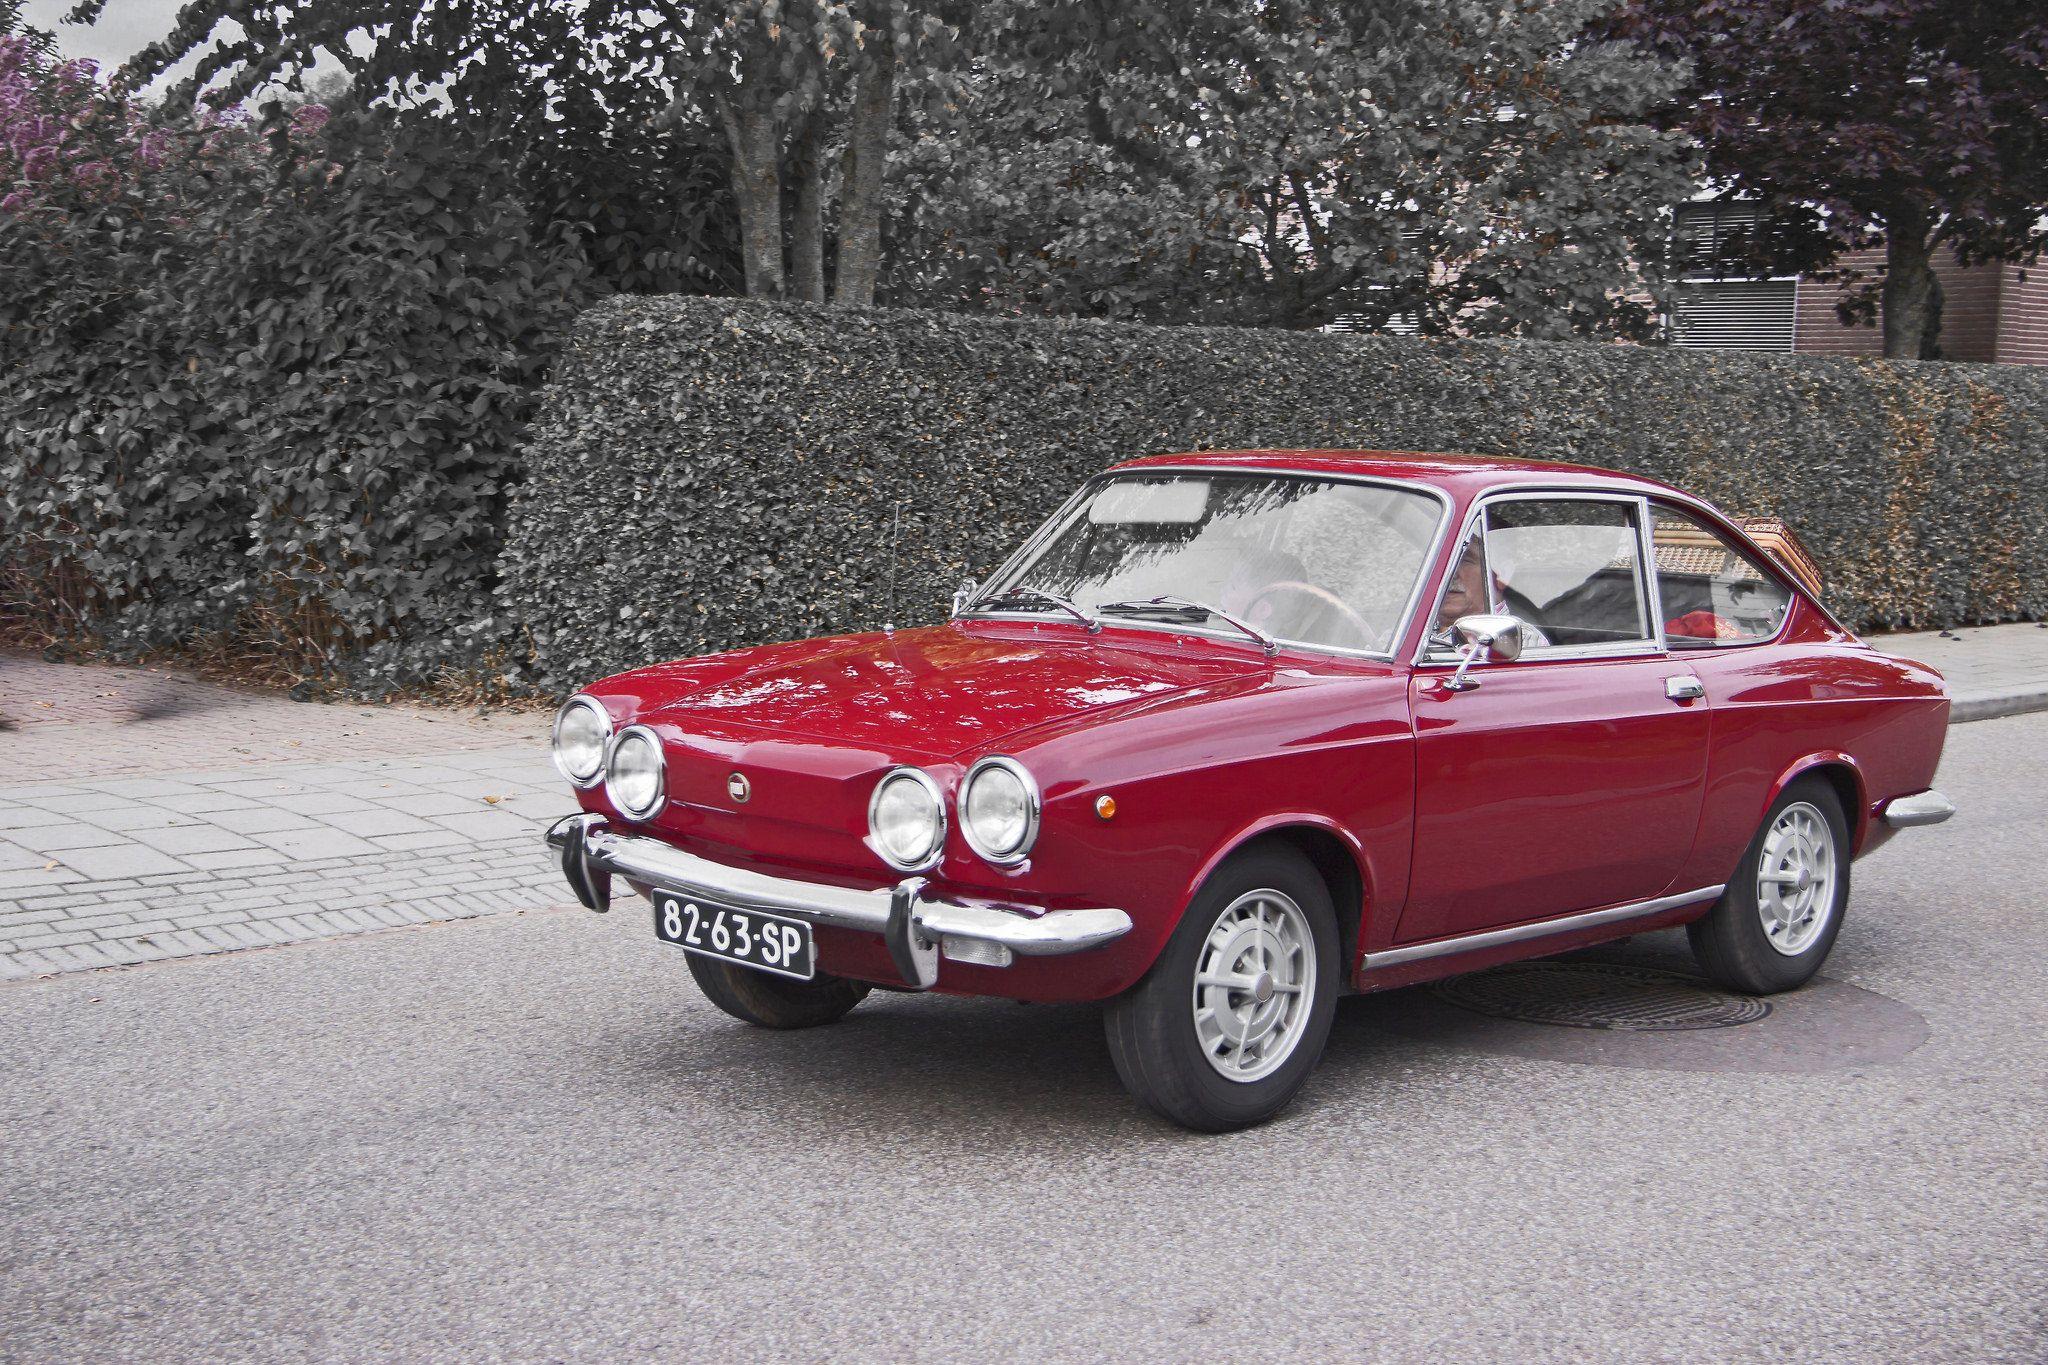 Fiat 850 Sport Coupe 1971 7259 Auto S En Motoren Voertuigen Auto